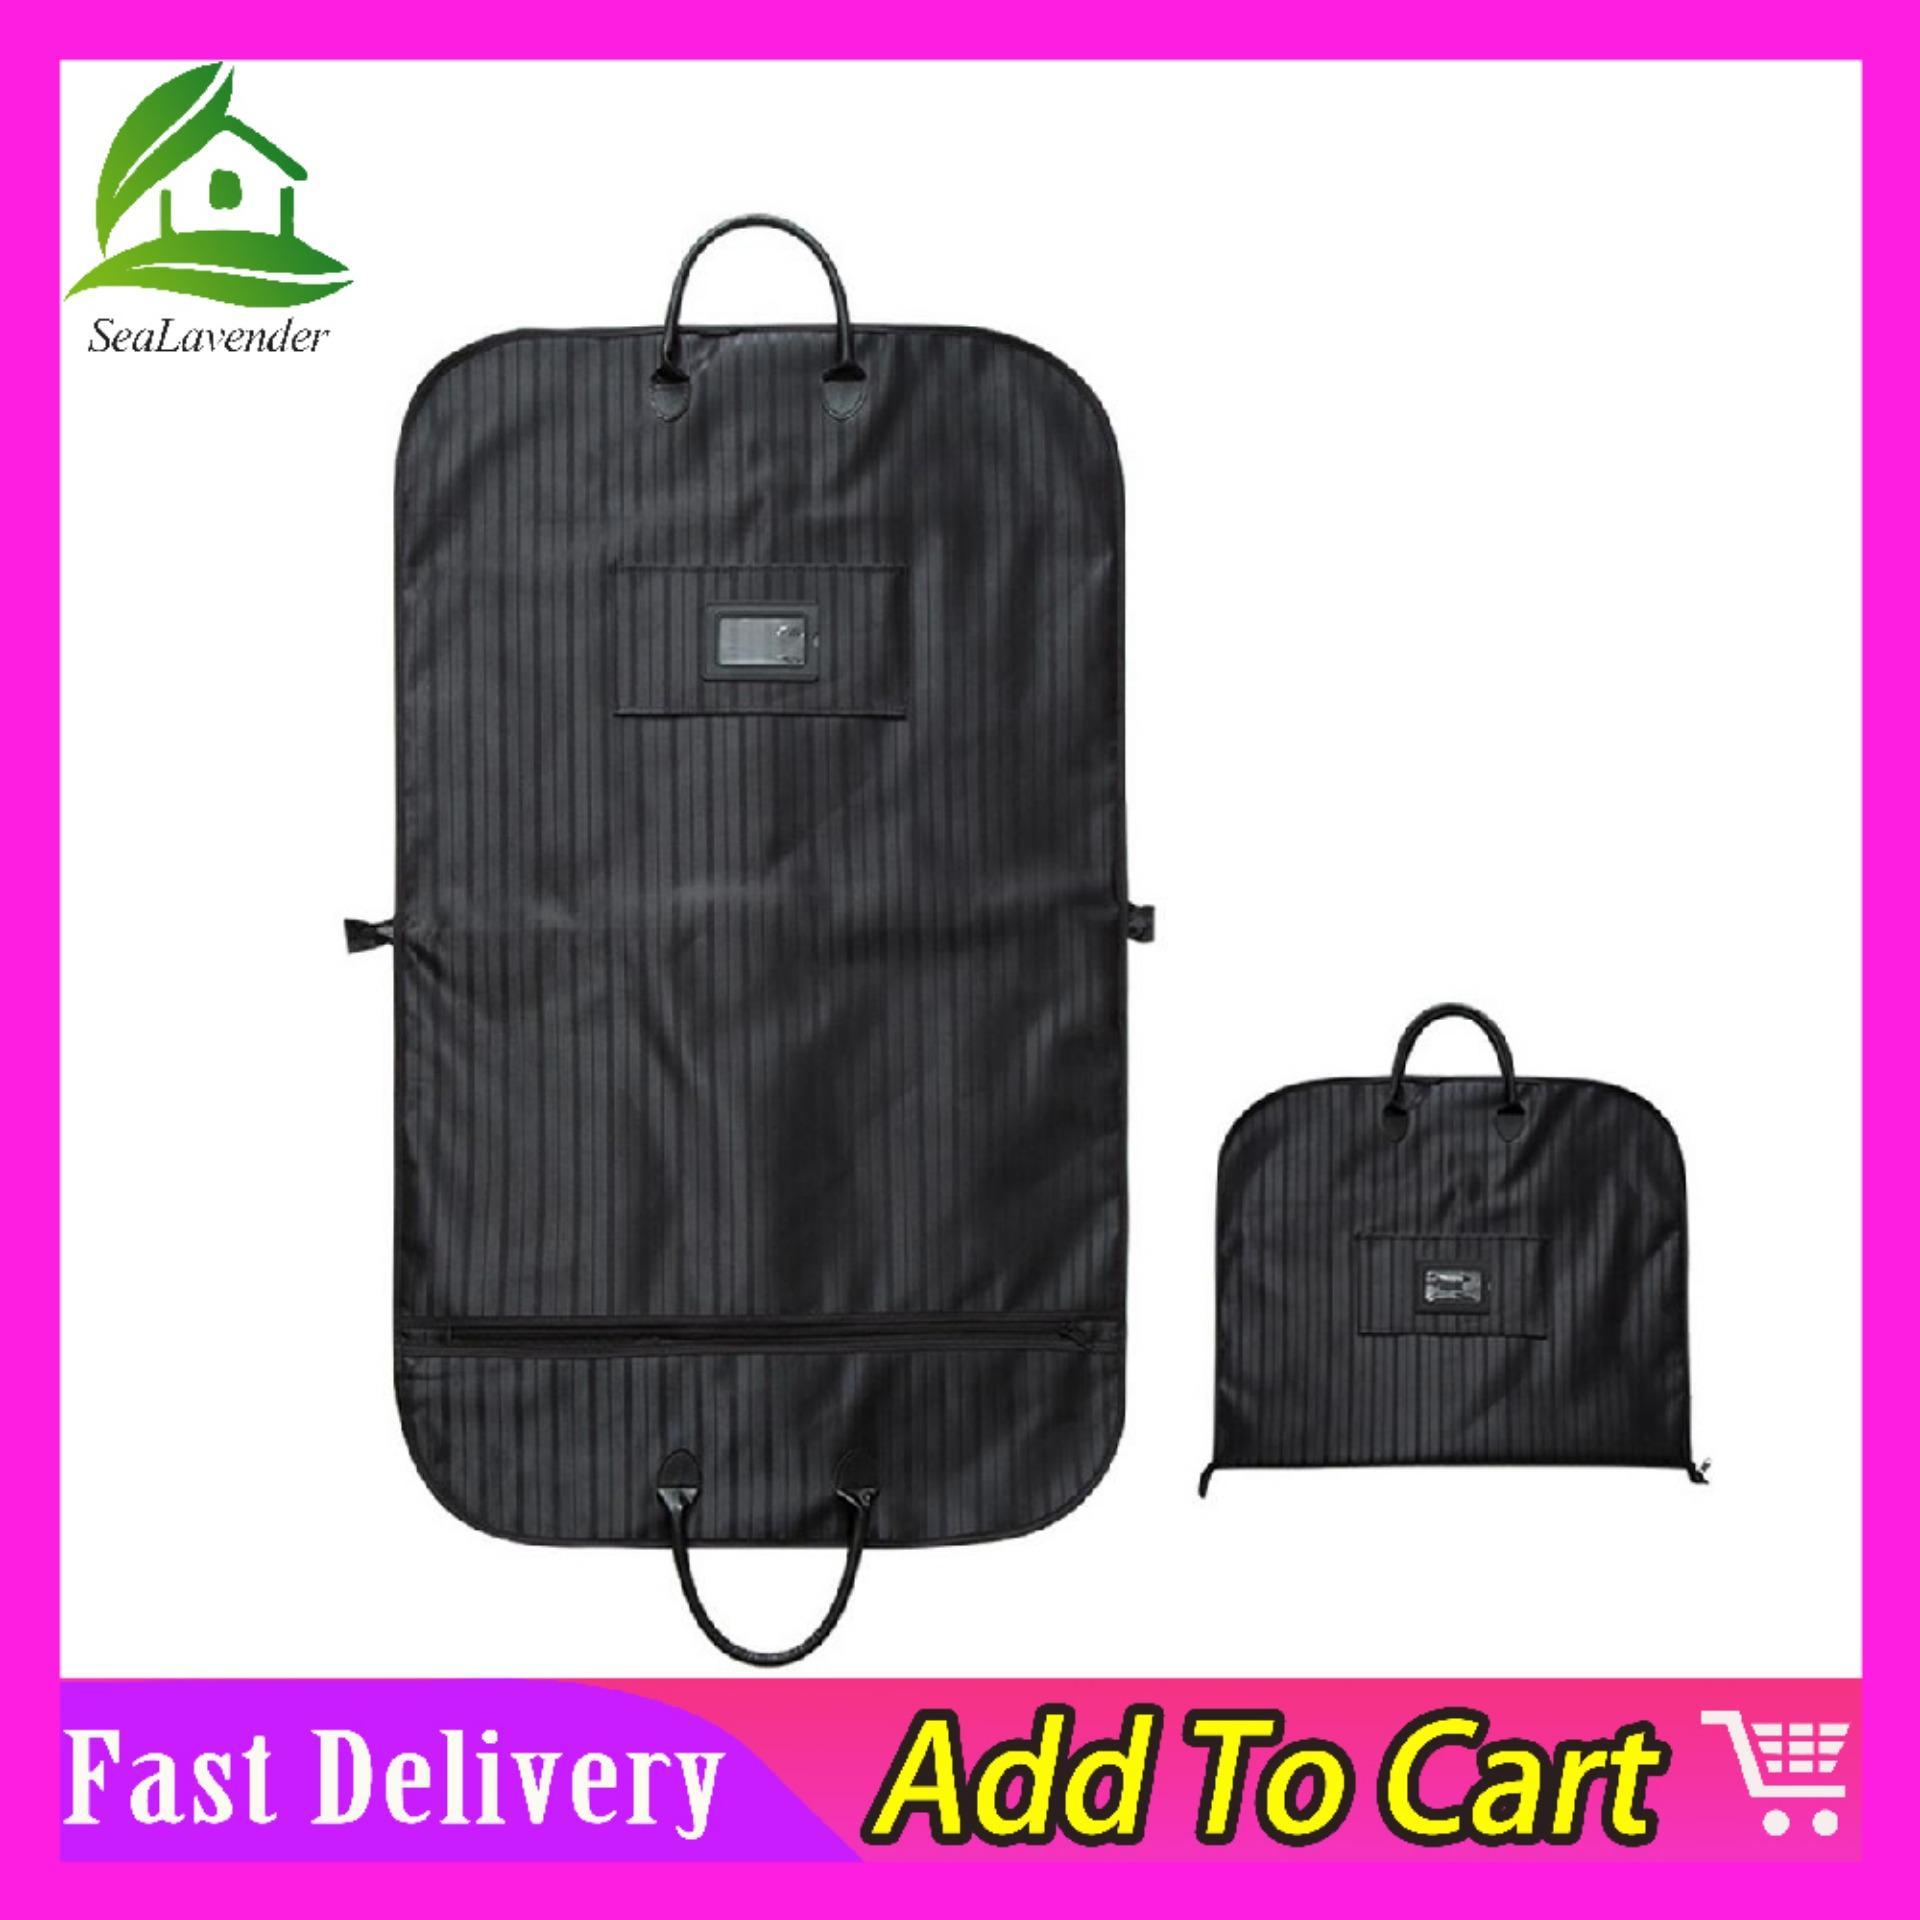 1b76d4e466a0 Garment Bag for sale - Suit Bags Online Deals & Prices in ...